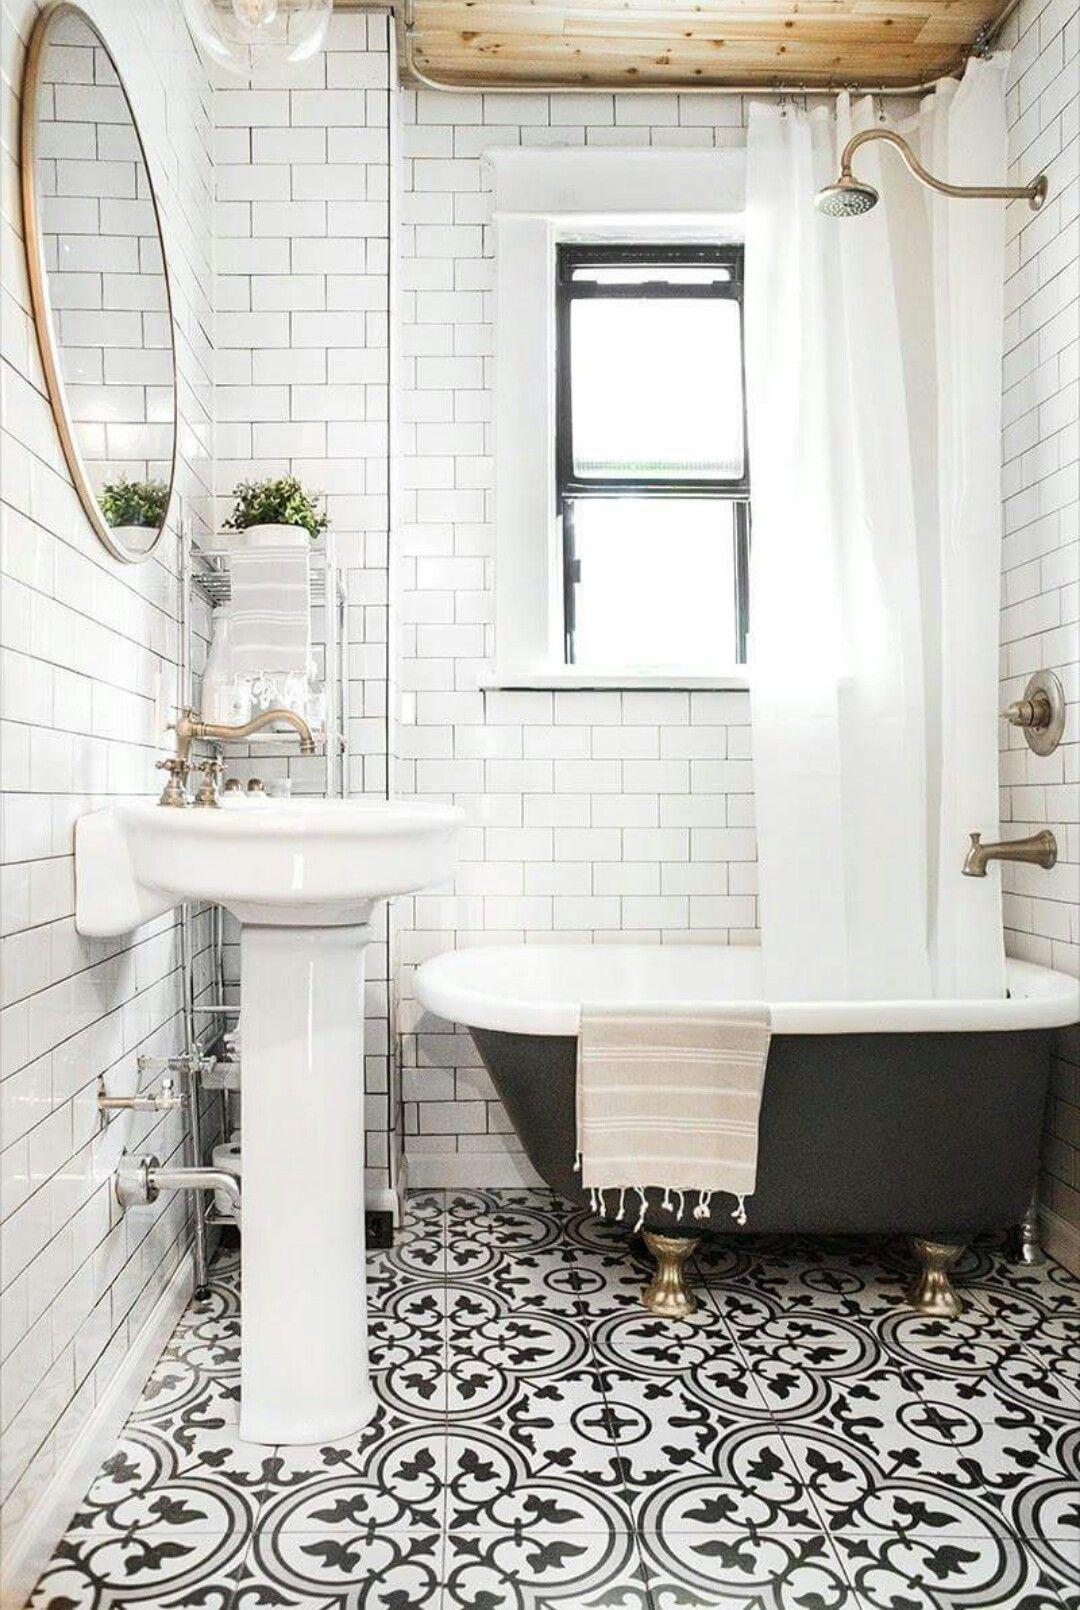 Subway tile and painted clawfoot tub in bathroom. Love. #tilebathtub ...